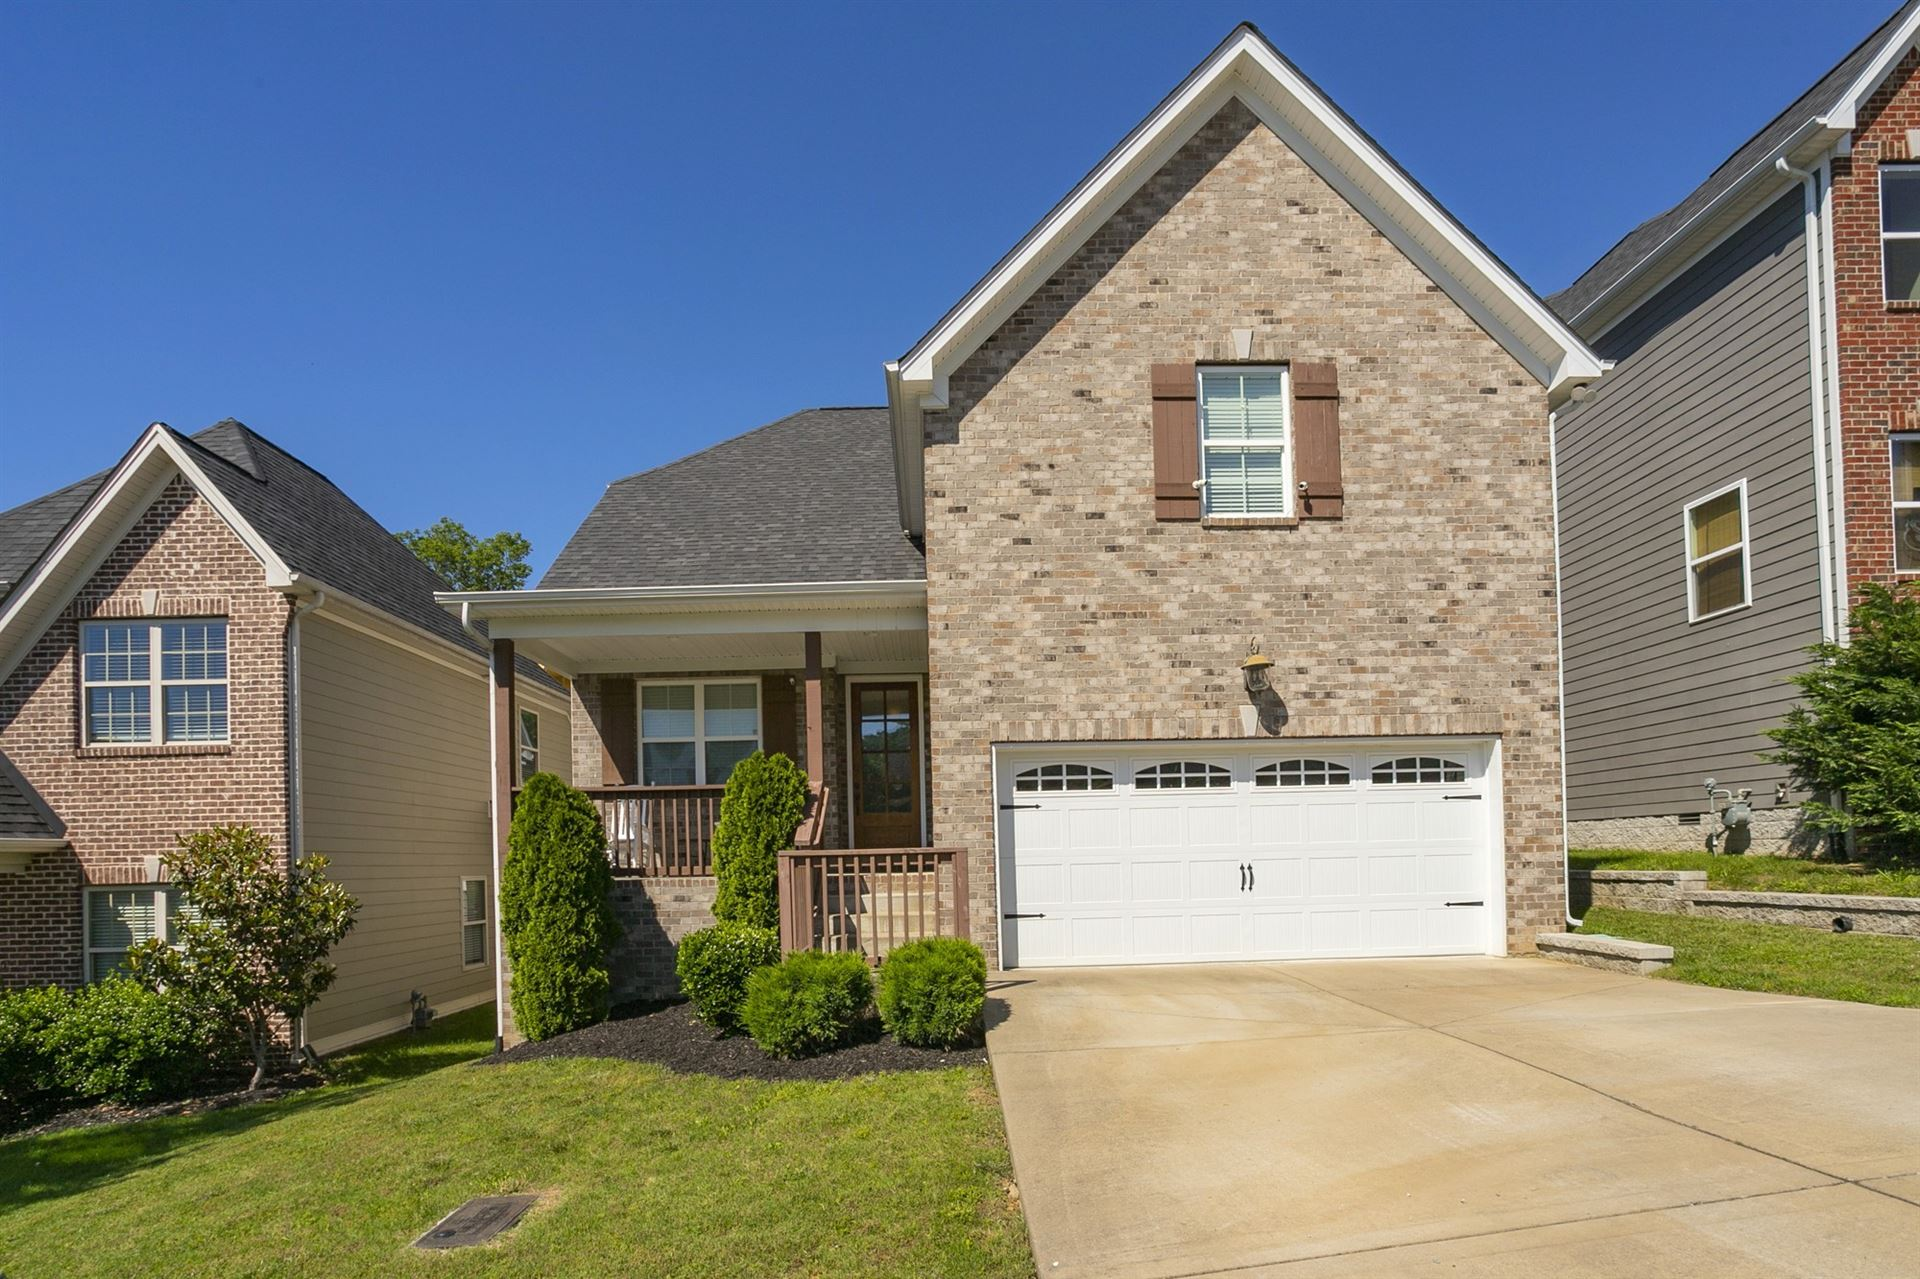 Photo of 5940 Woodlands Ave, Nashville, TN 37211 (MLS # 2170030)